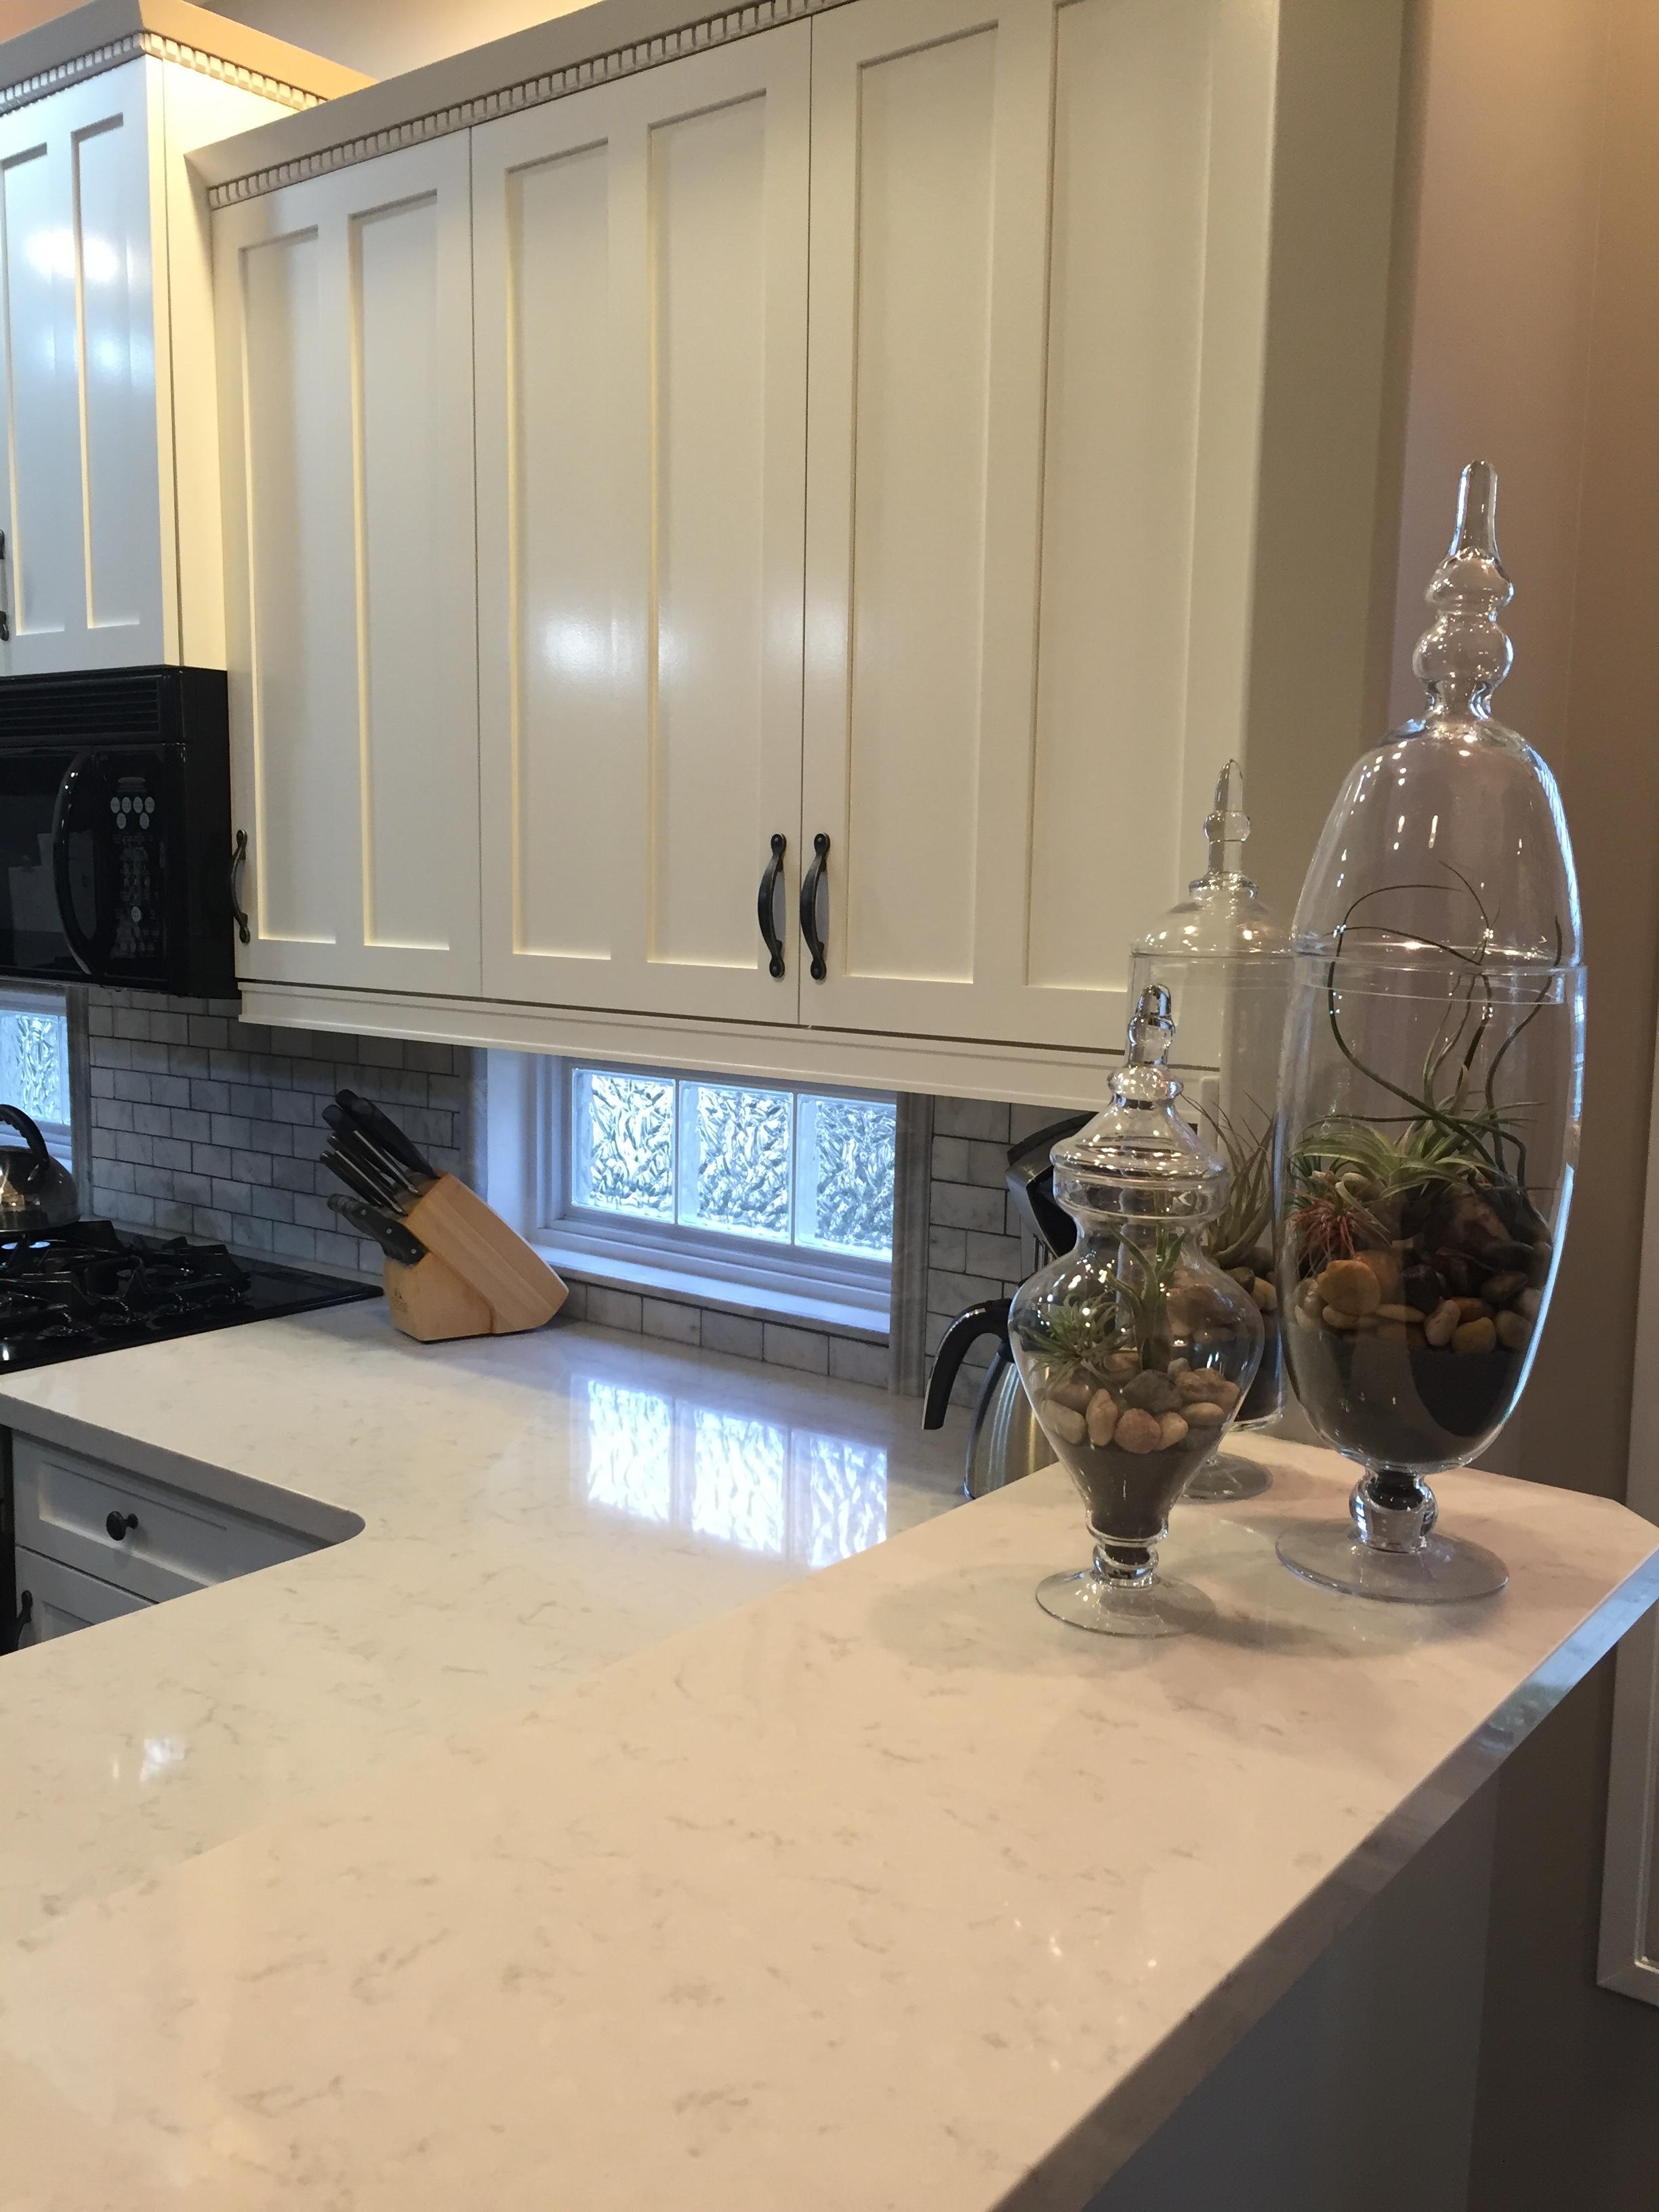 White Quartz countertop, painted cabinetry, marble backsplash.